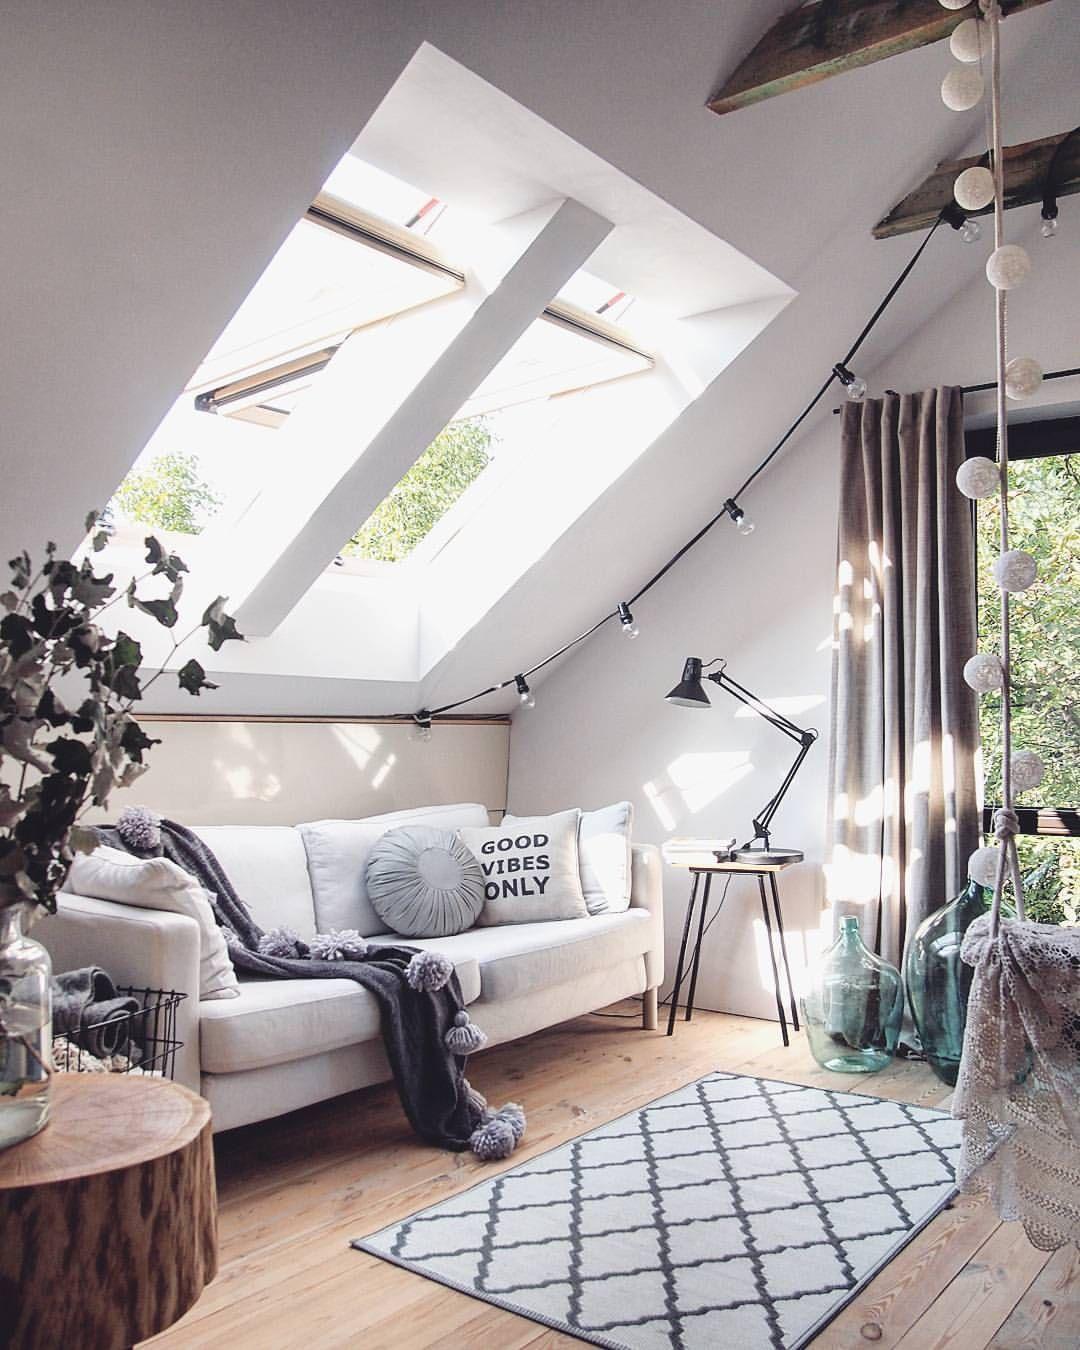 Home-office-innenarchitektur inspiration reading nook marzenarideko an u gefällt  mal  home